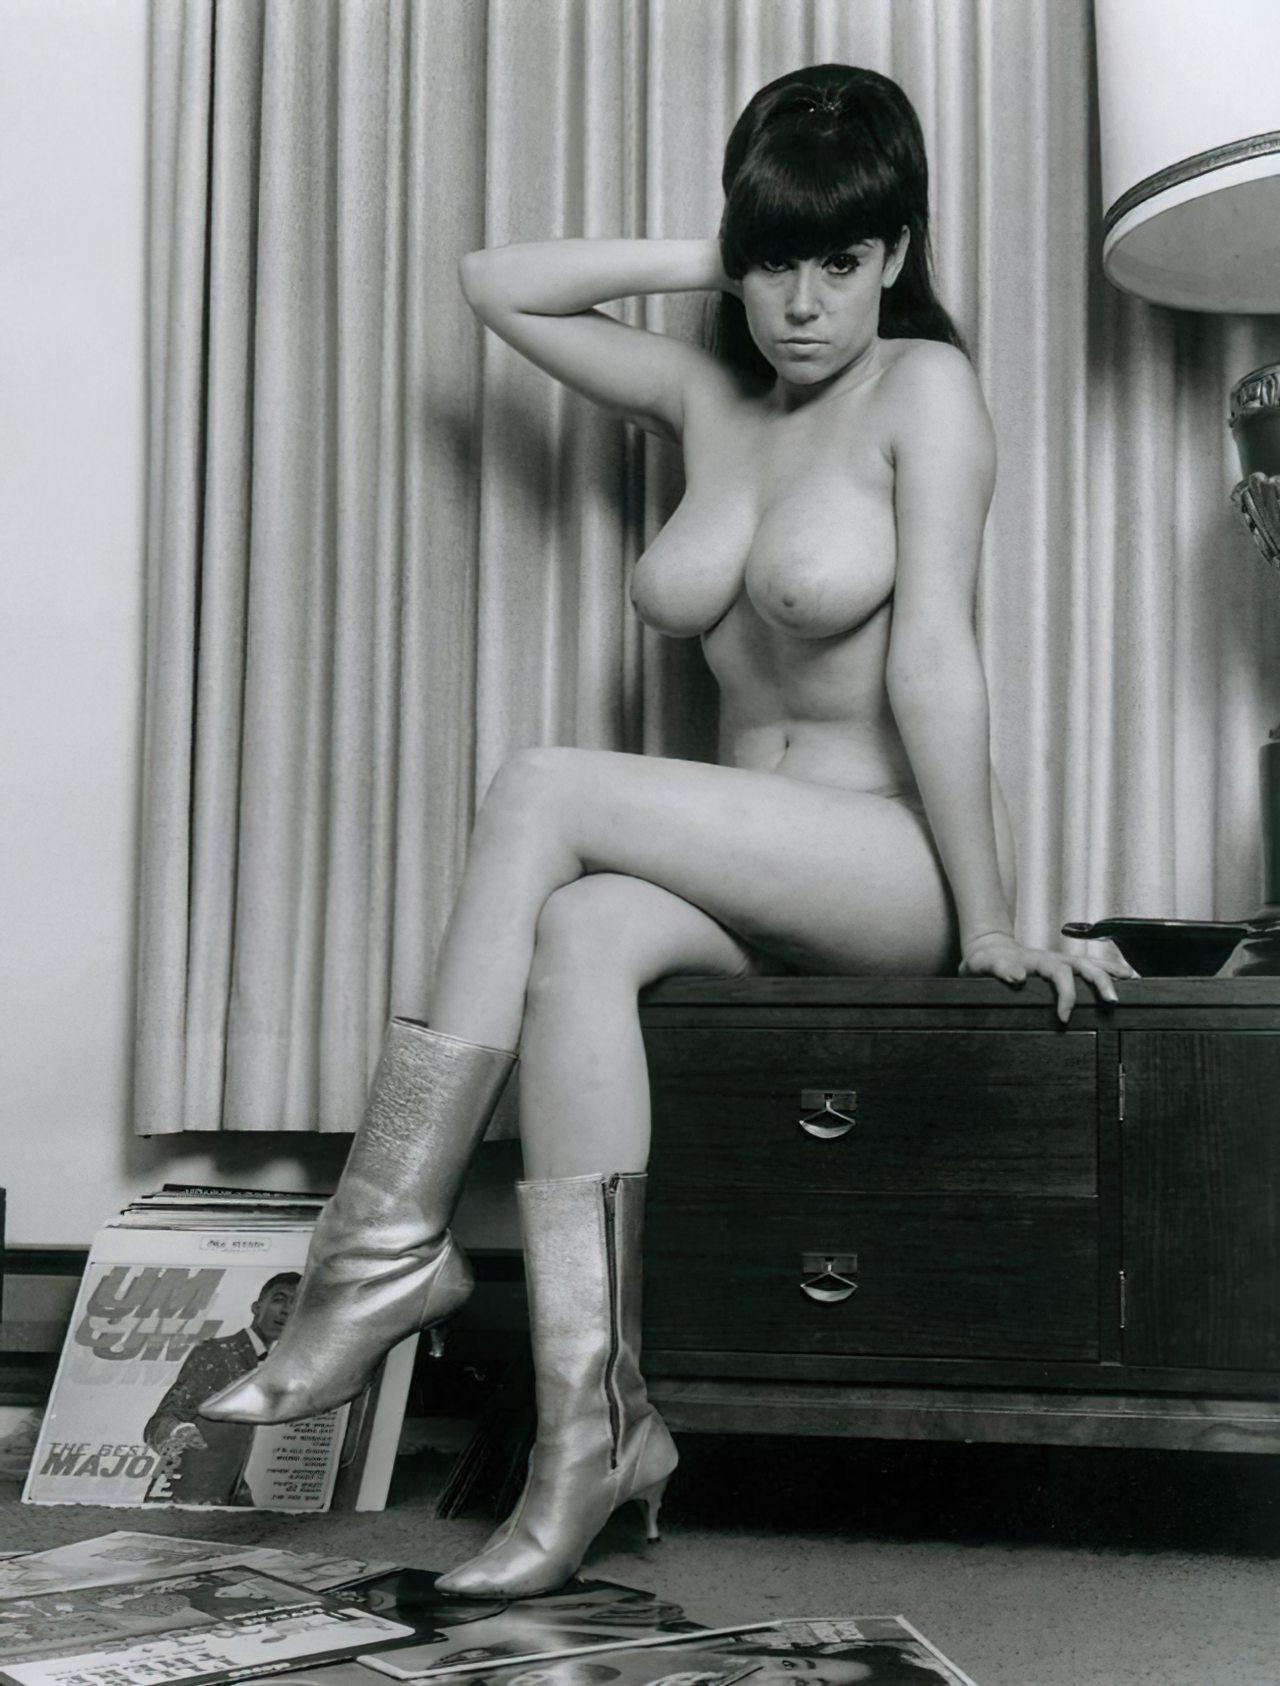 Fotos dos Anos 70 e 80 (4)